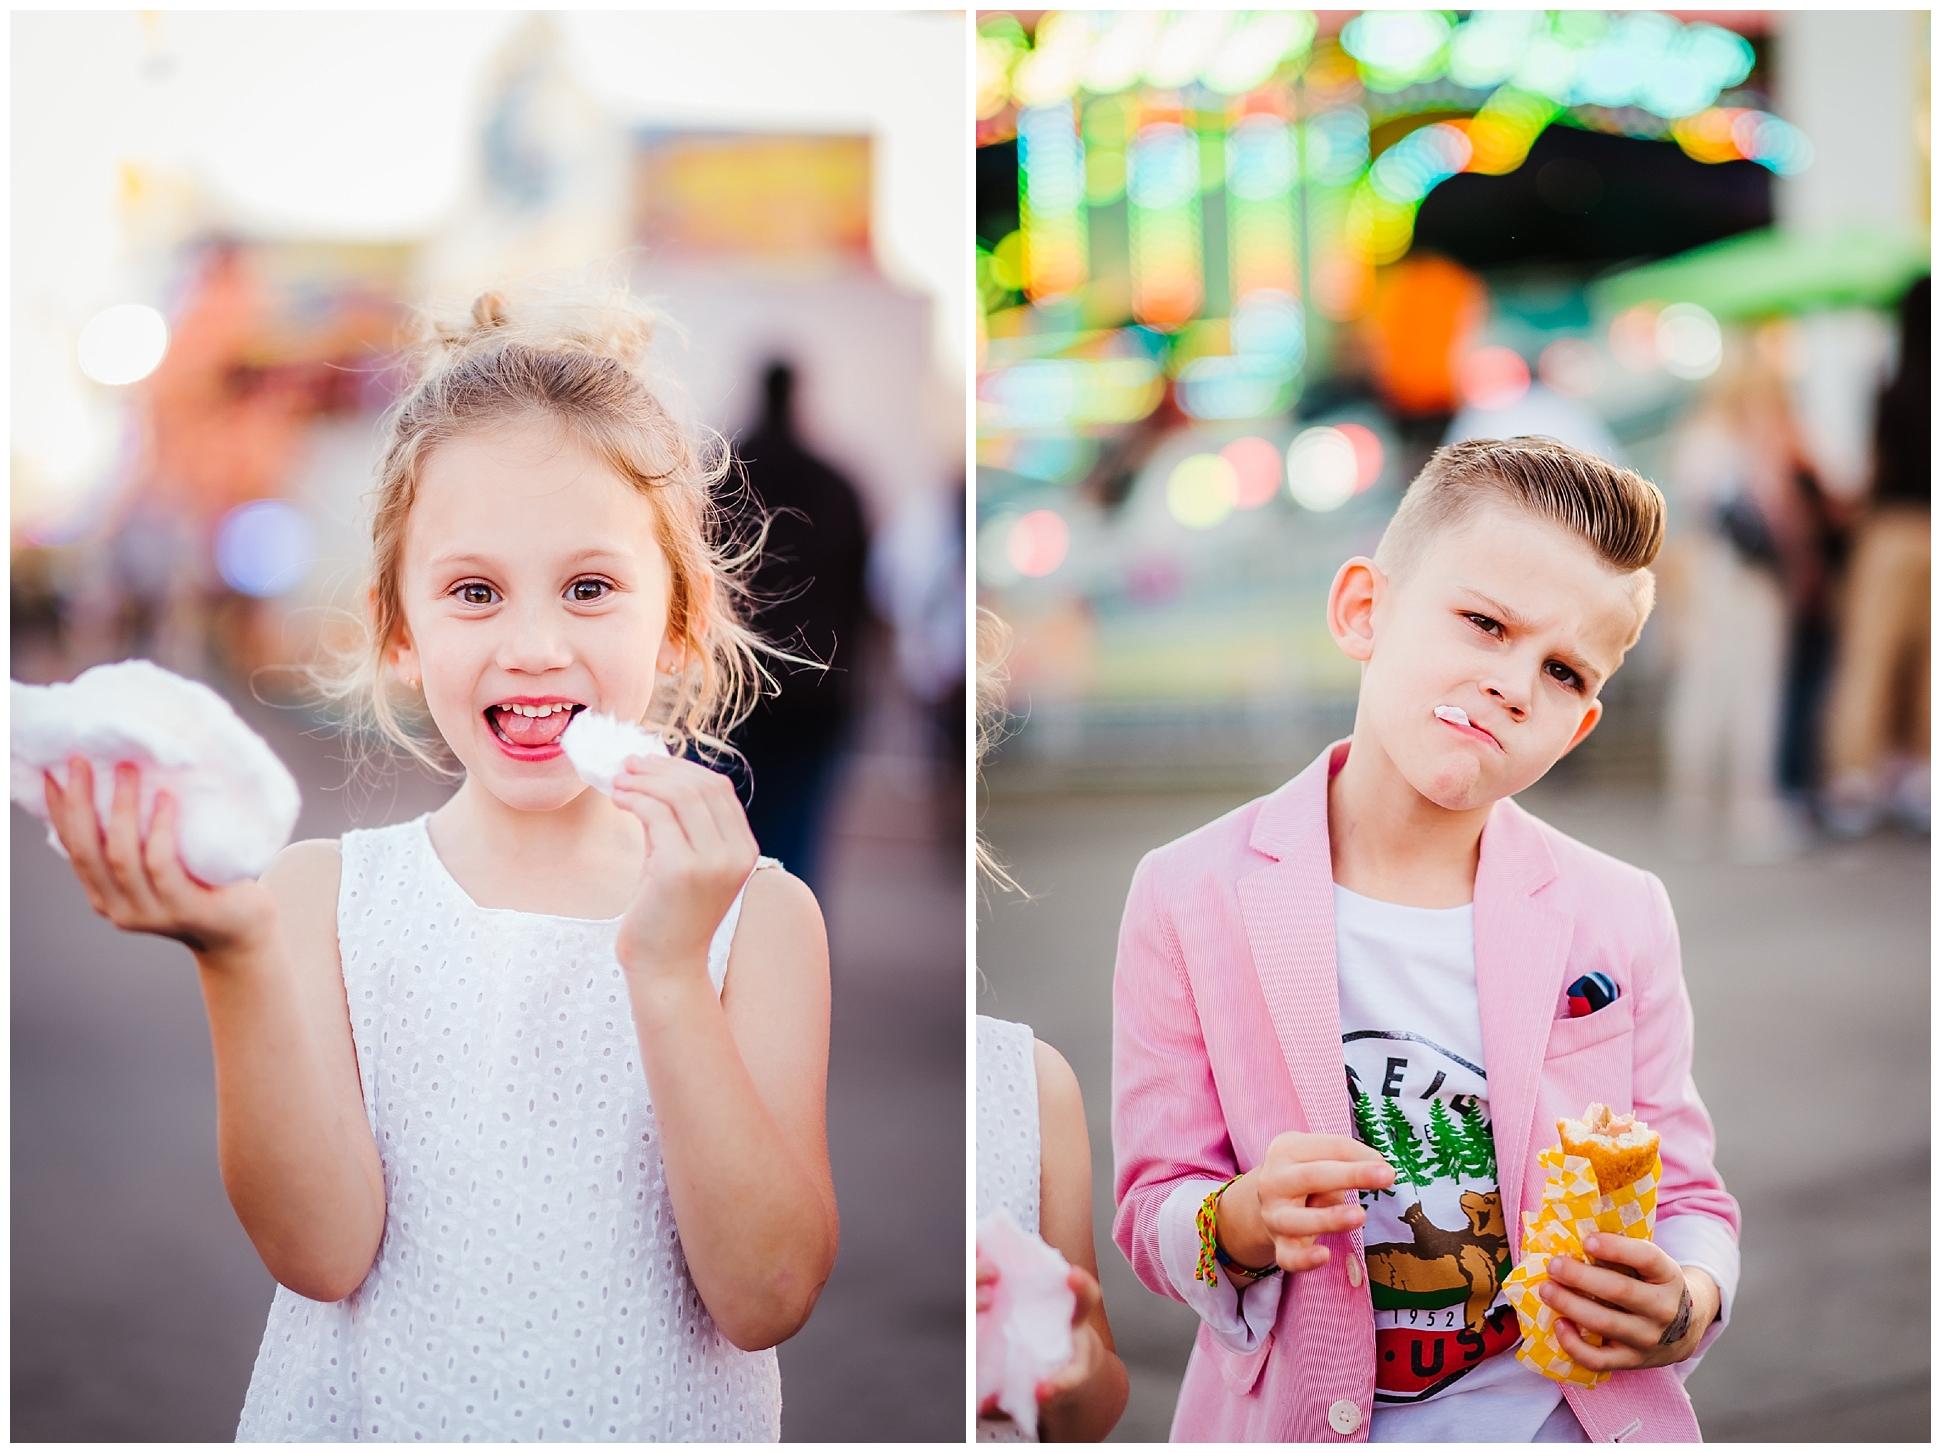 Tampa-colorful-fair-amusement park-family session_0028.jpg